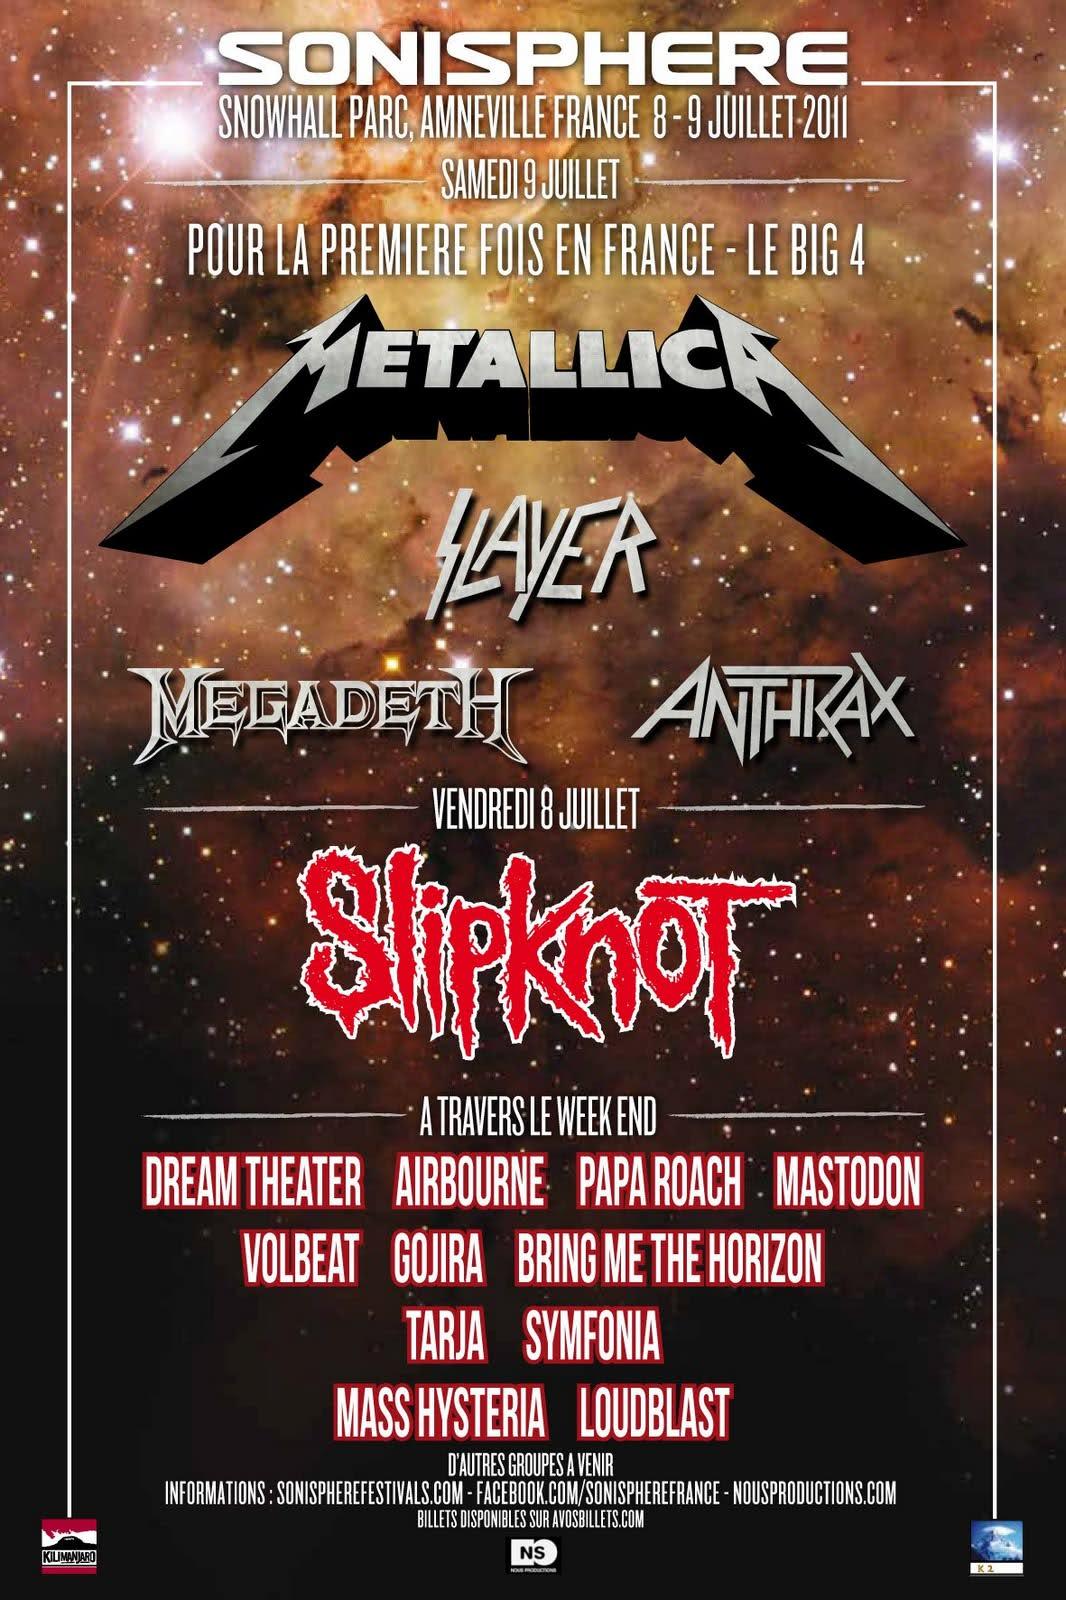 Sonisphere 2011 - All Metal Festivals